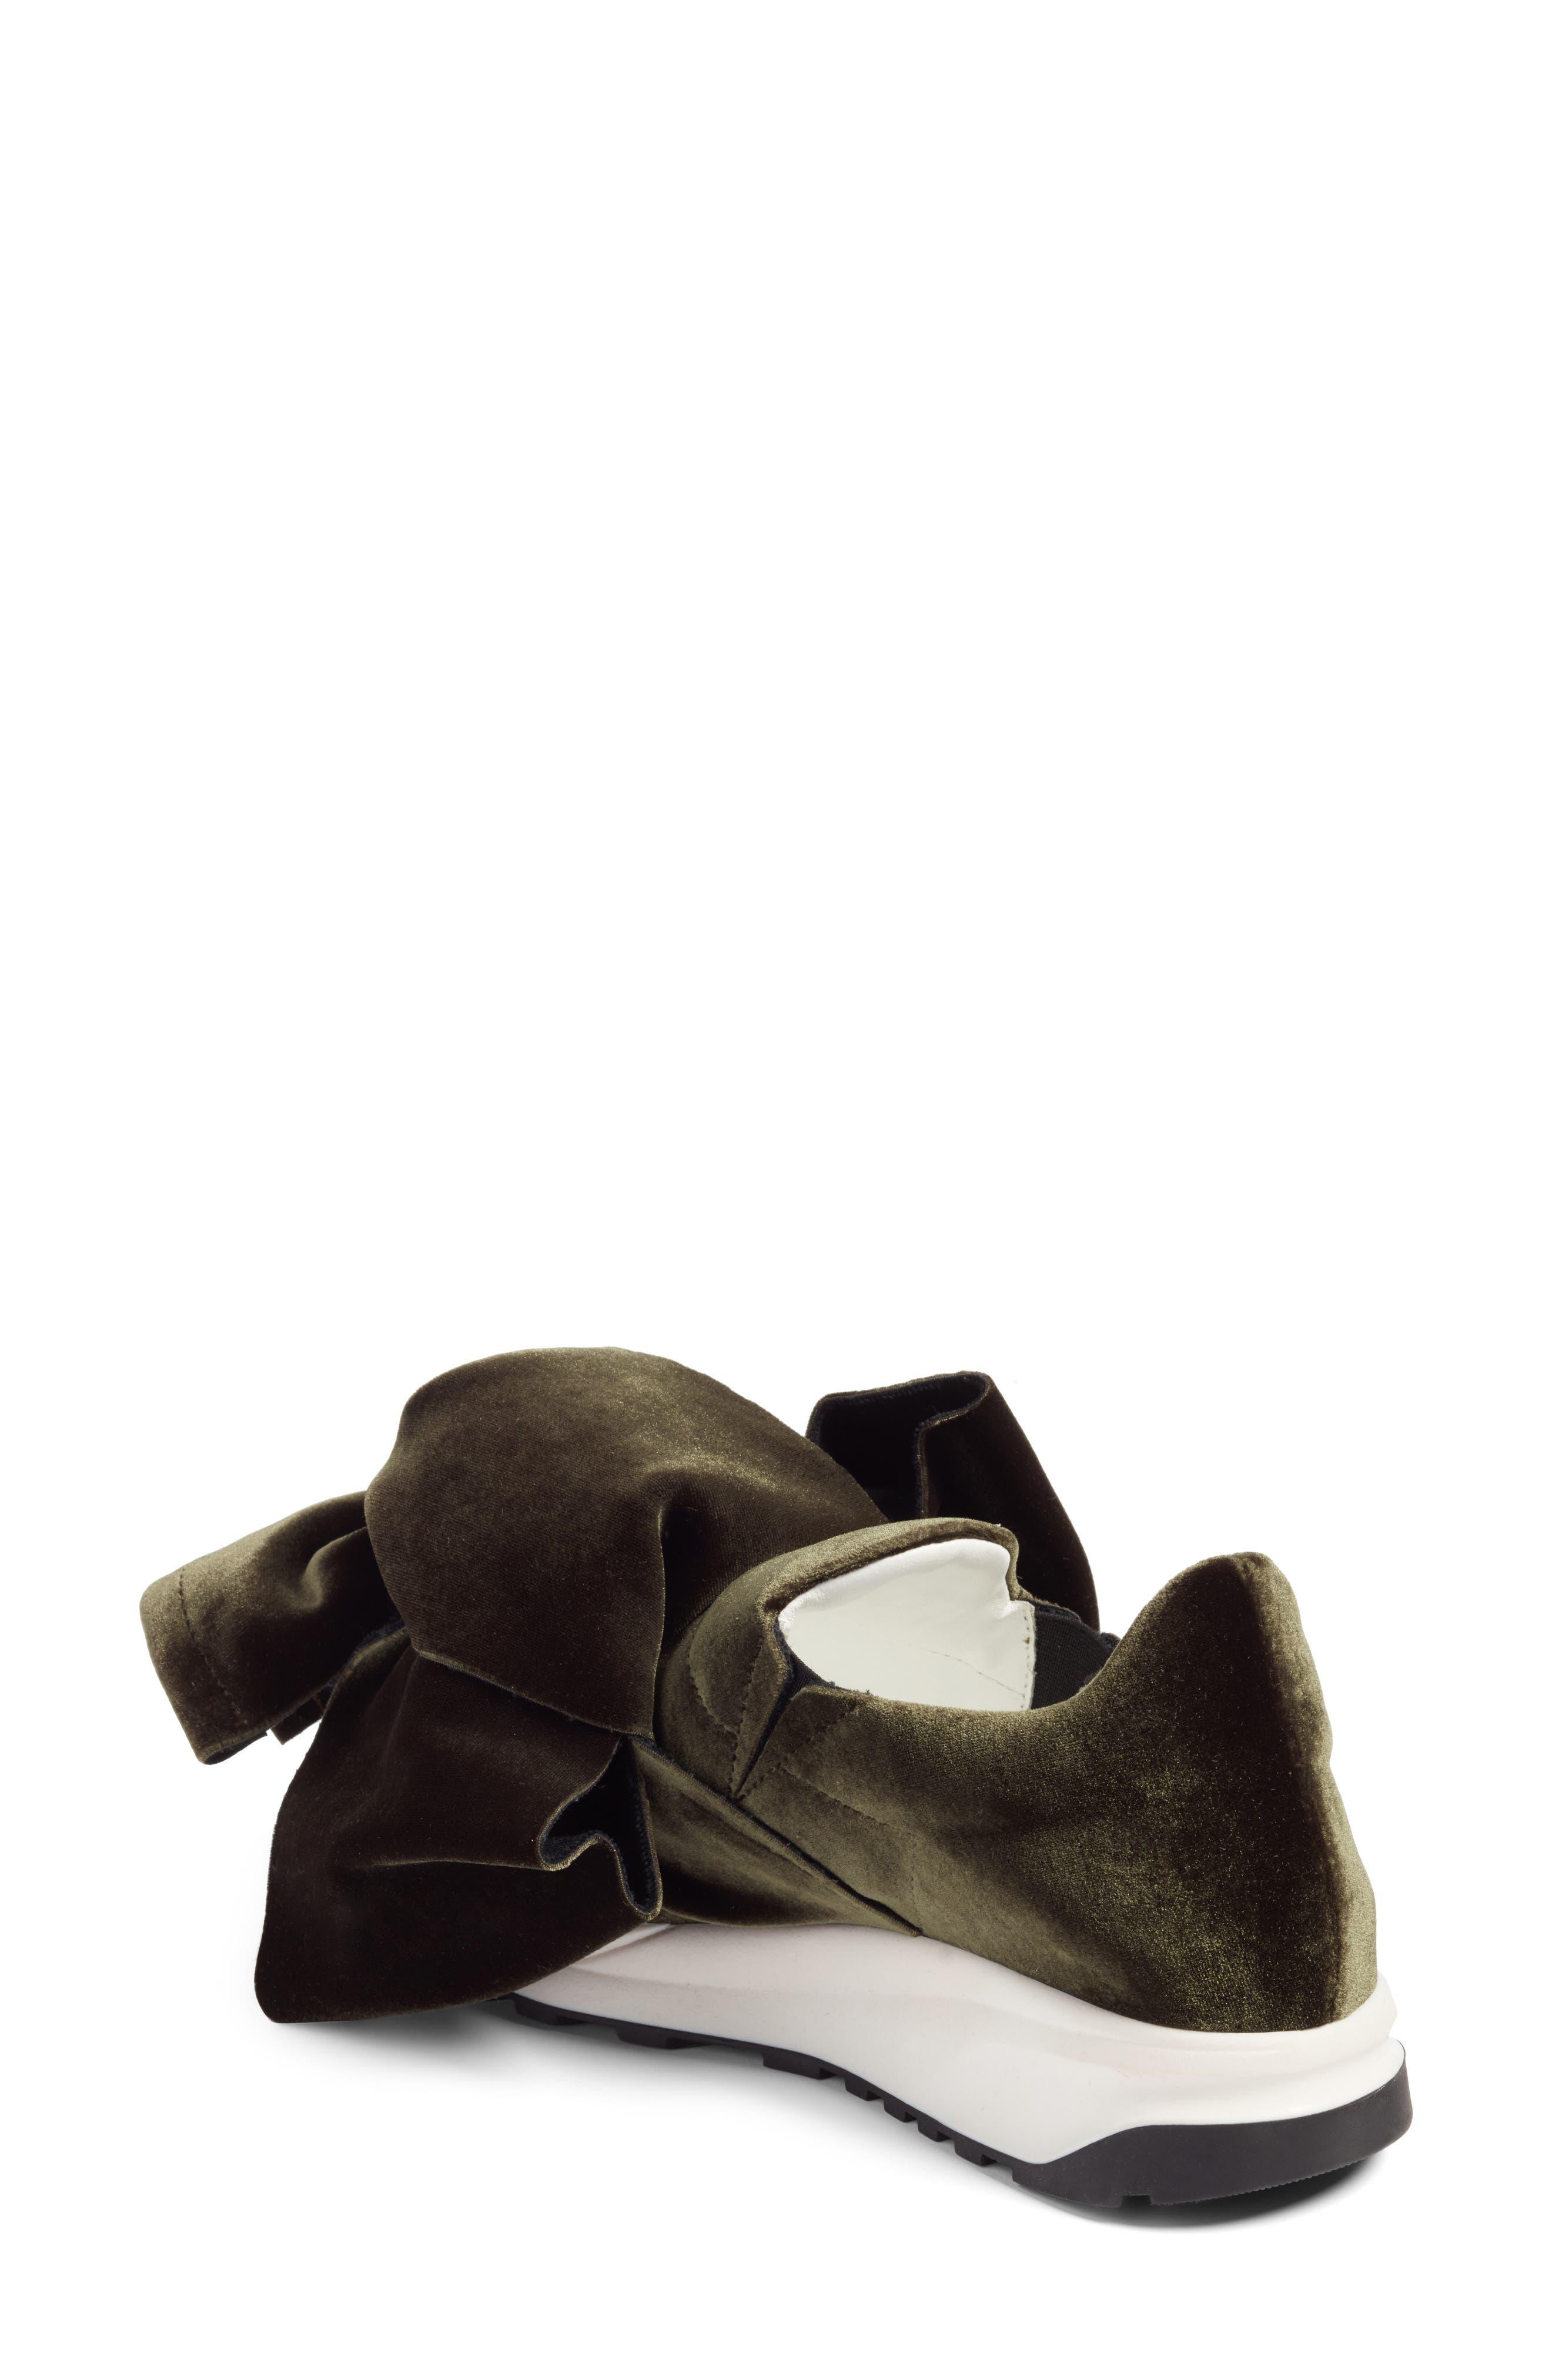 Knotted Slip-On Sneaker,                             Alternate thumbnail 2, color,                             300